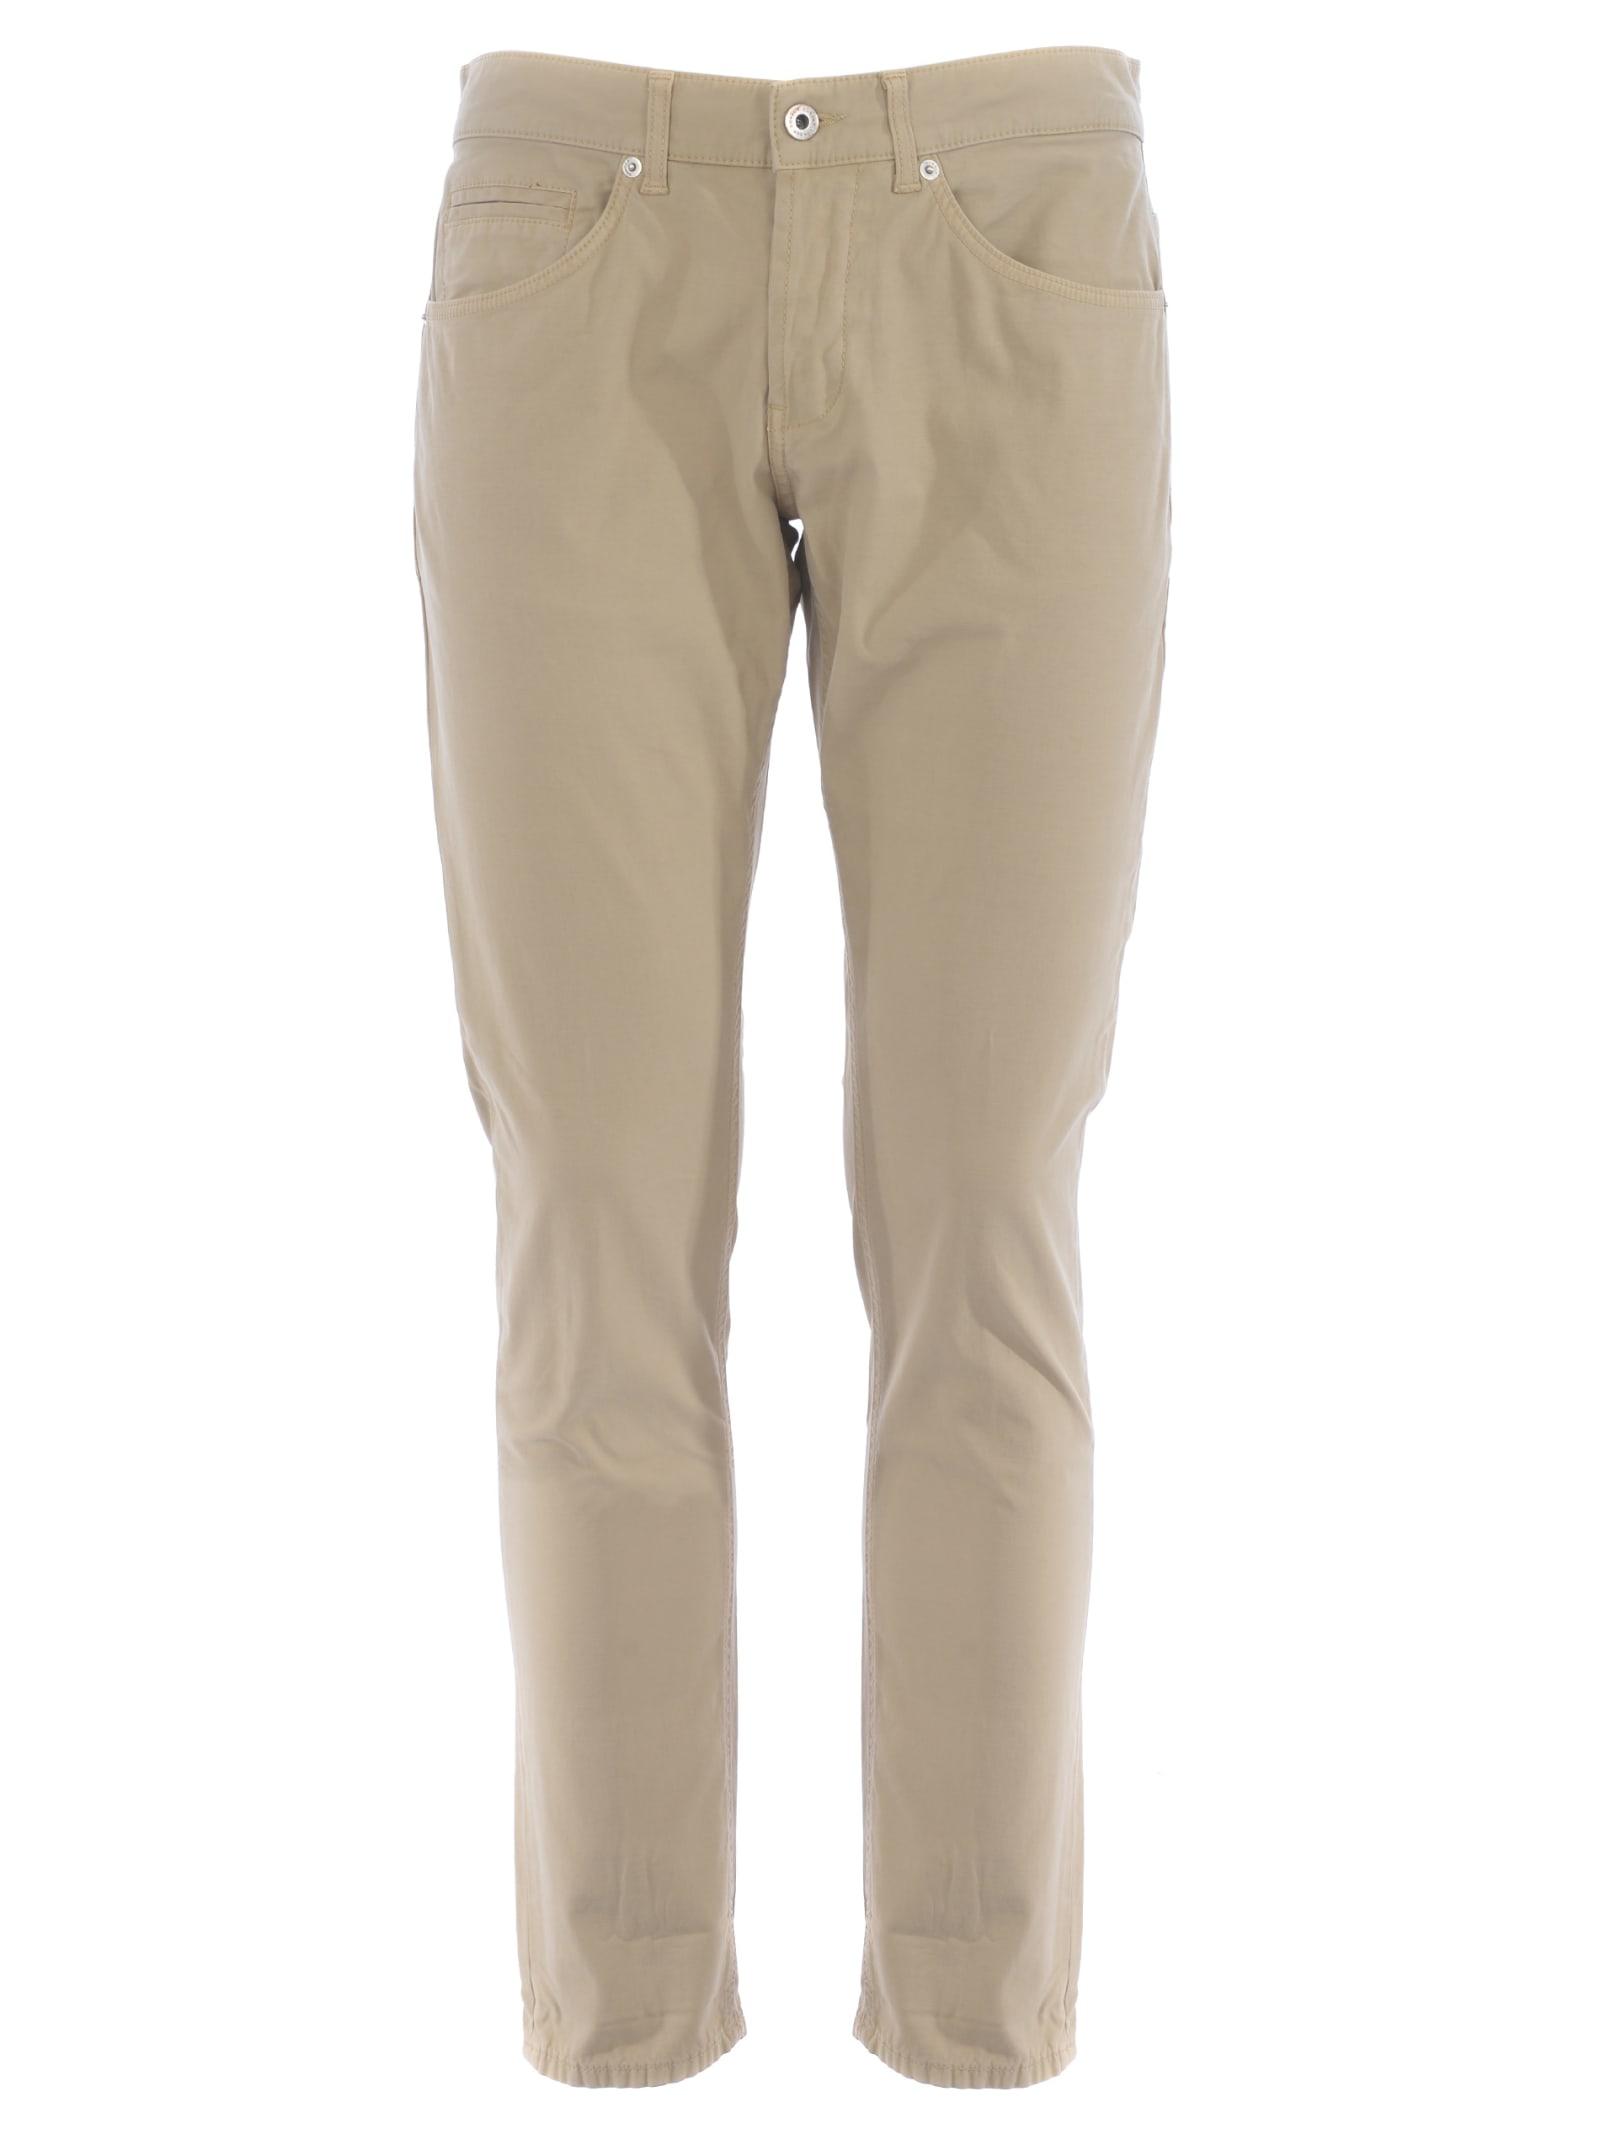 Dondup Pants In Beige